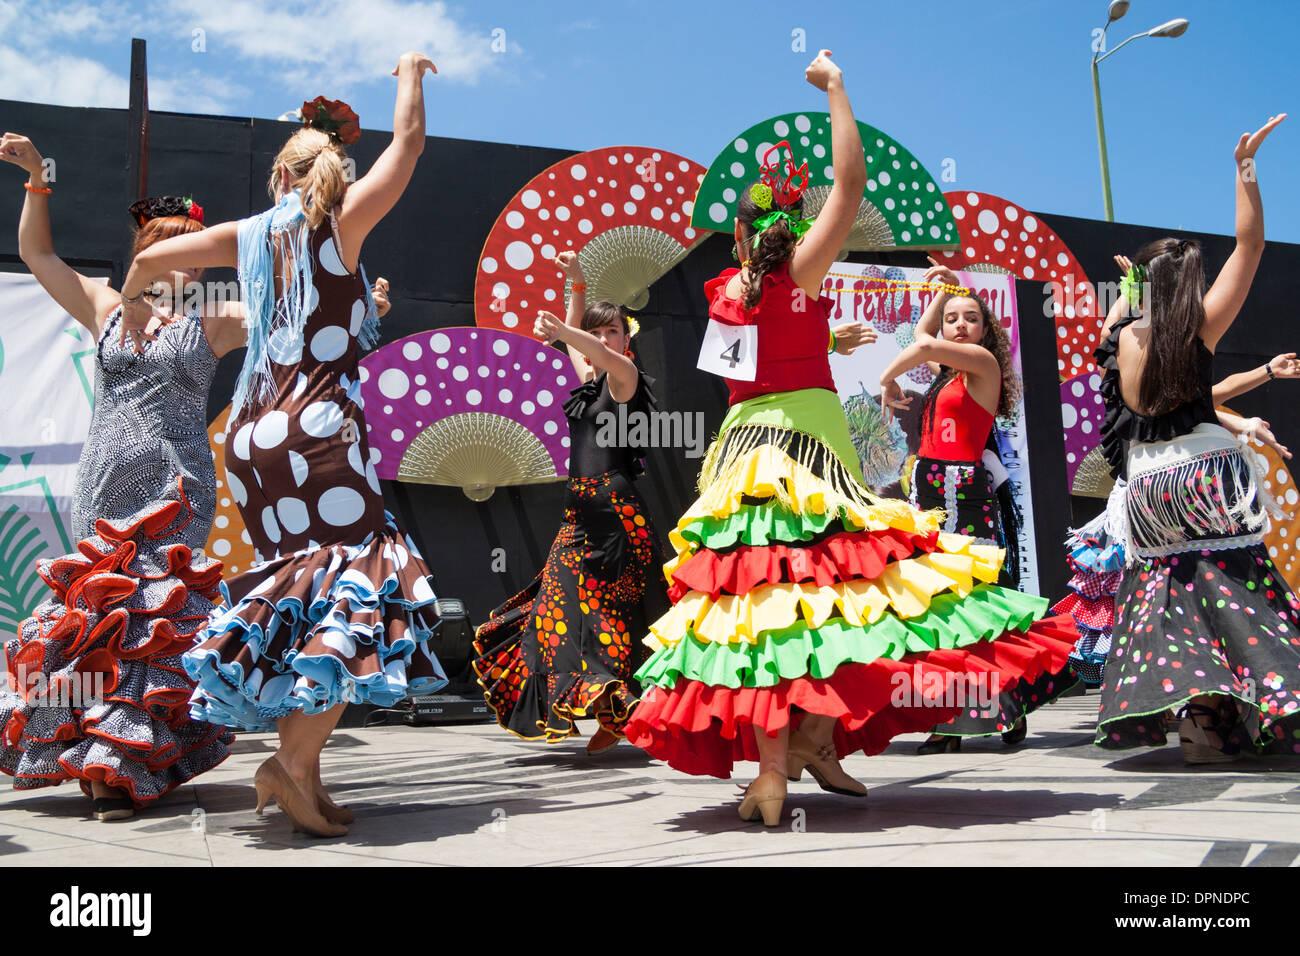 Flamenco-Tänzer bei Feria de Abril Flamenco Wochenende in Las Palmas, Gran Canaria, Kanarische Inseln, Spanien Stockbild